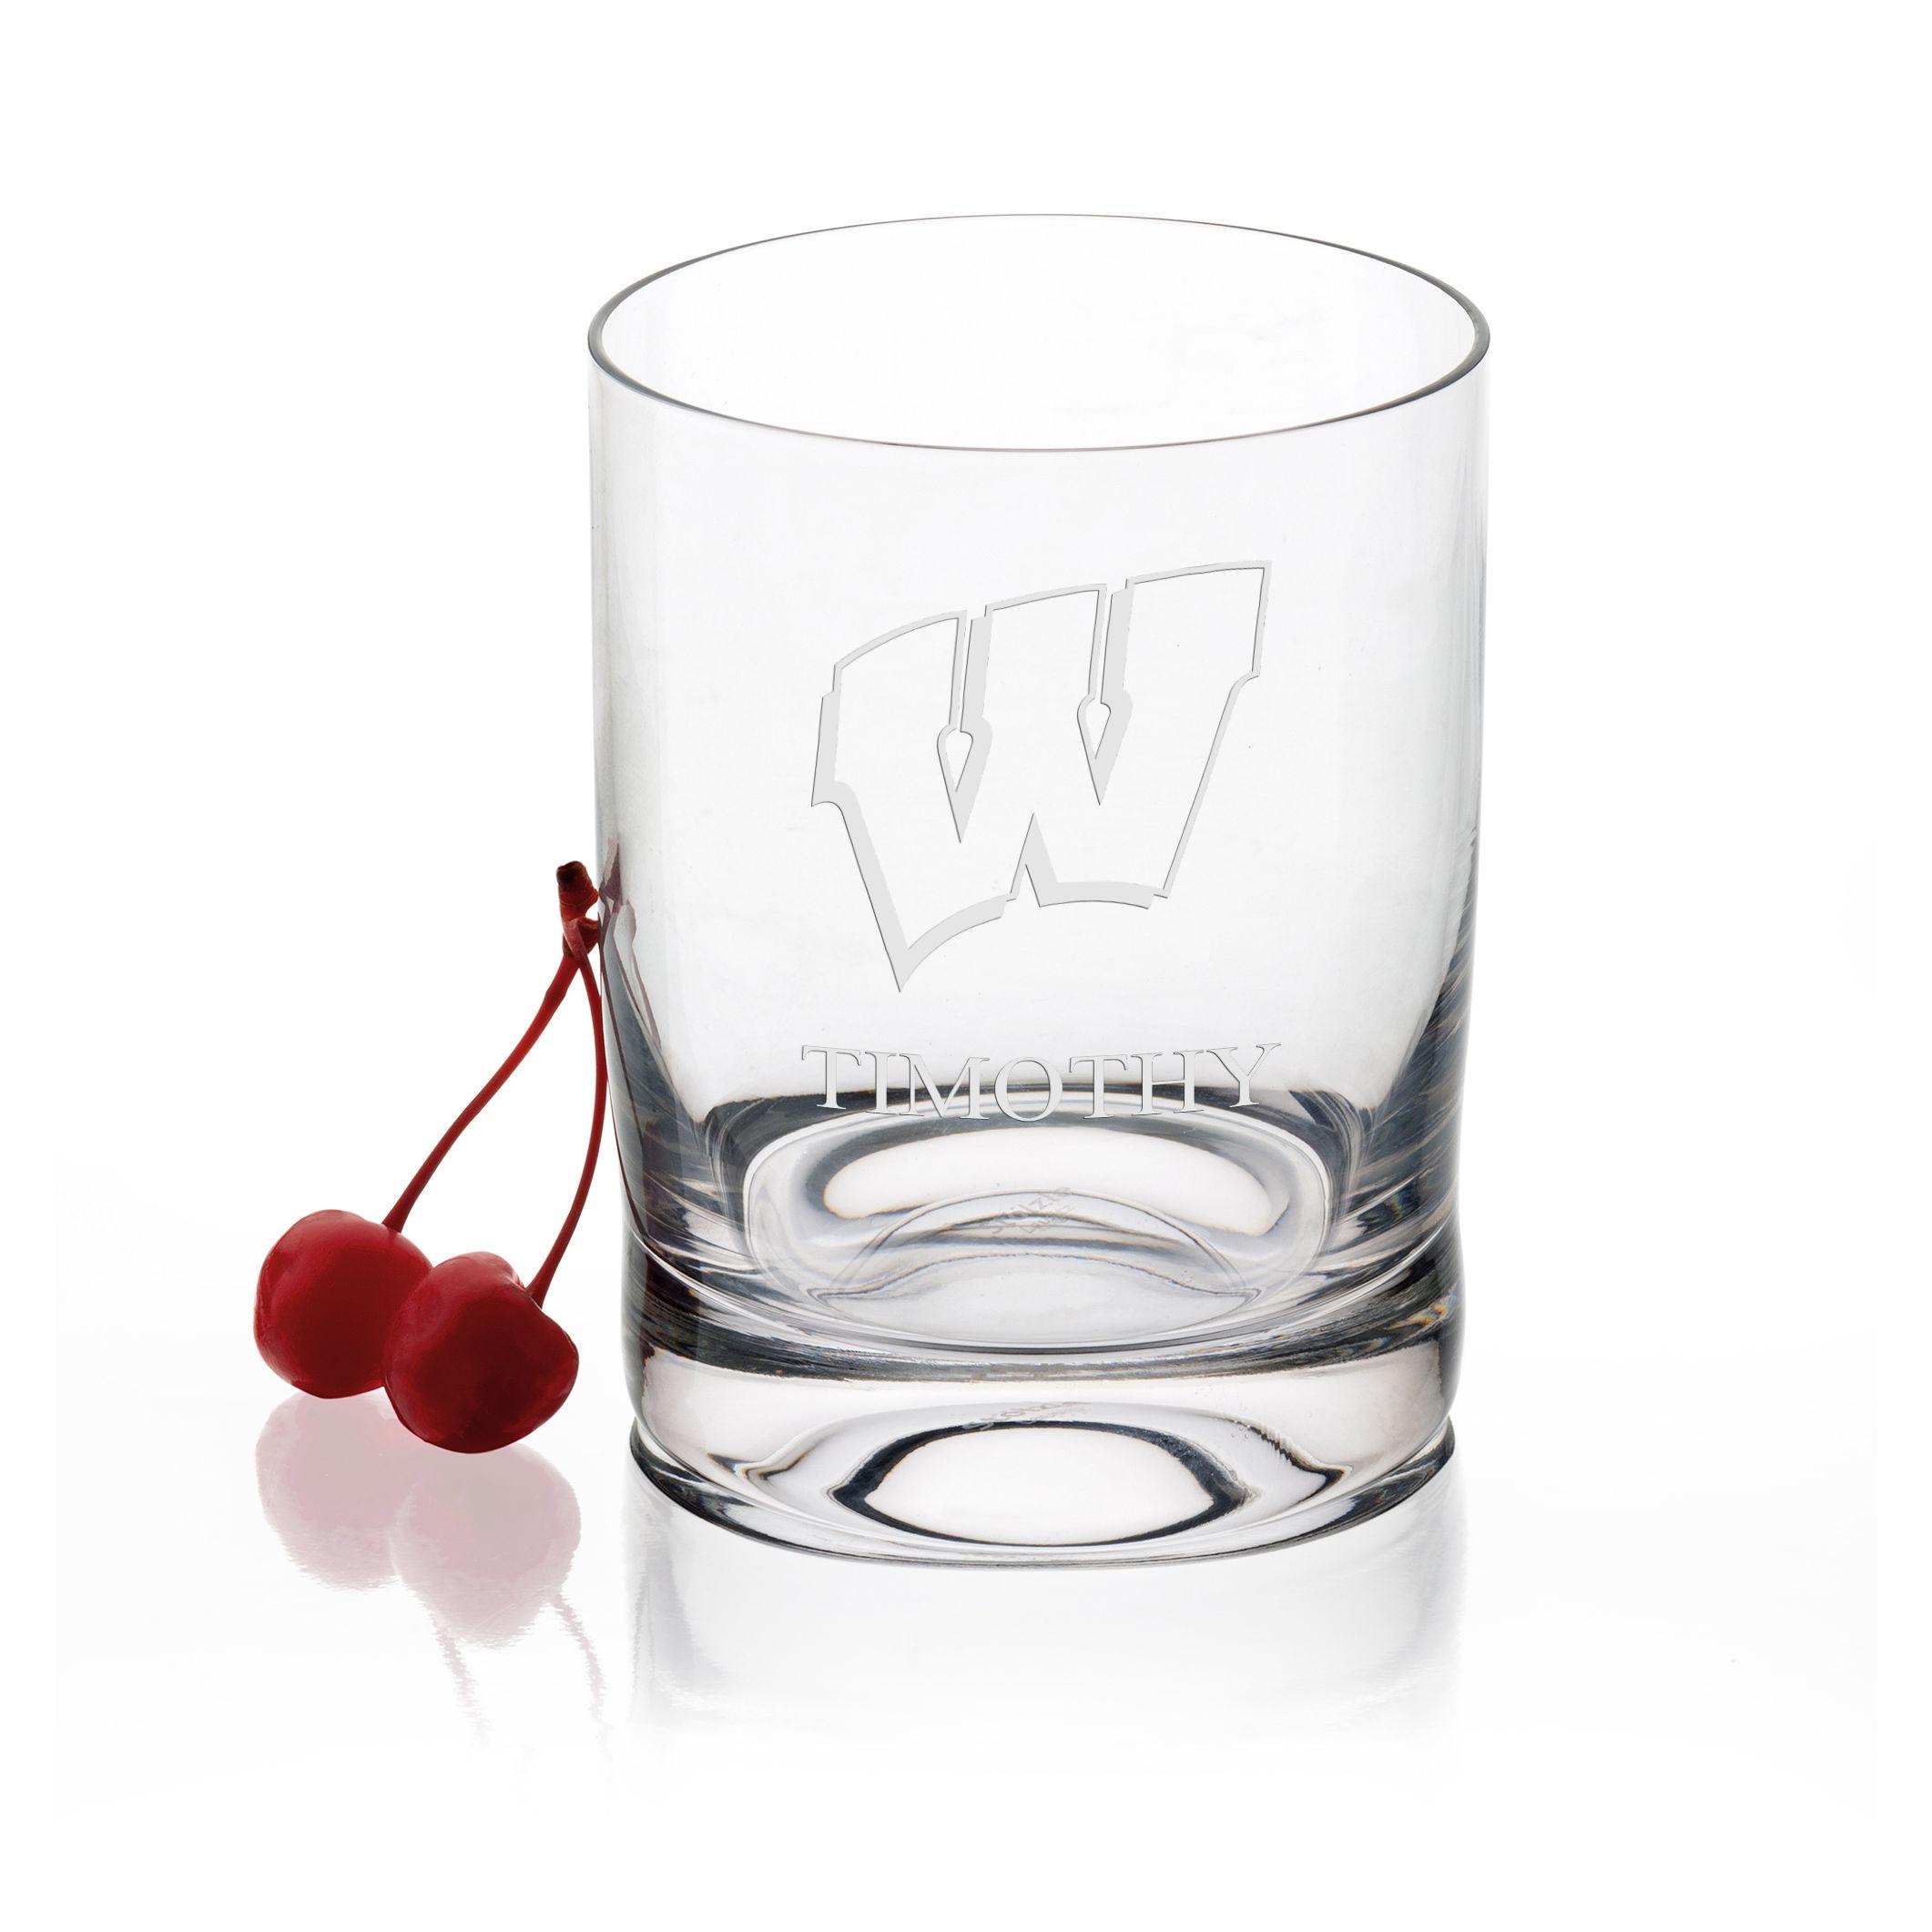 Wisconsin Tumbler Glasses - Set of 4